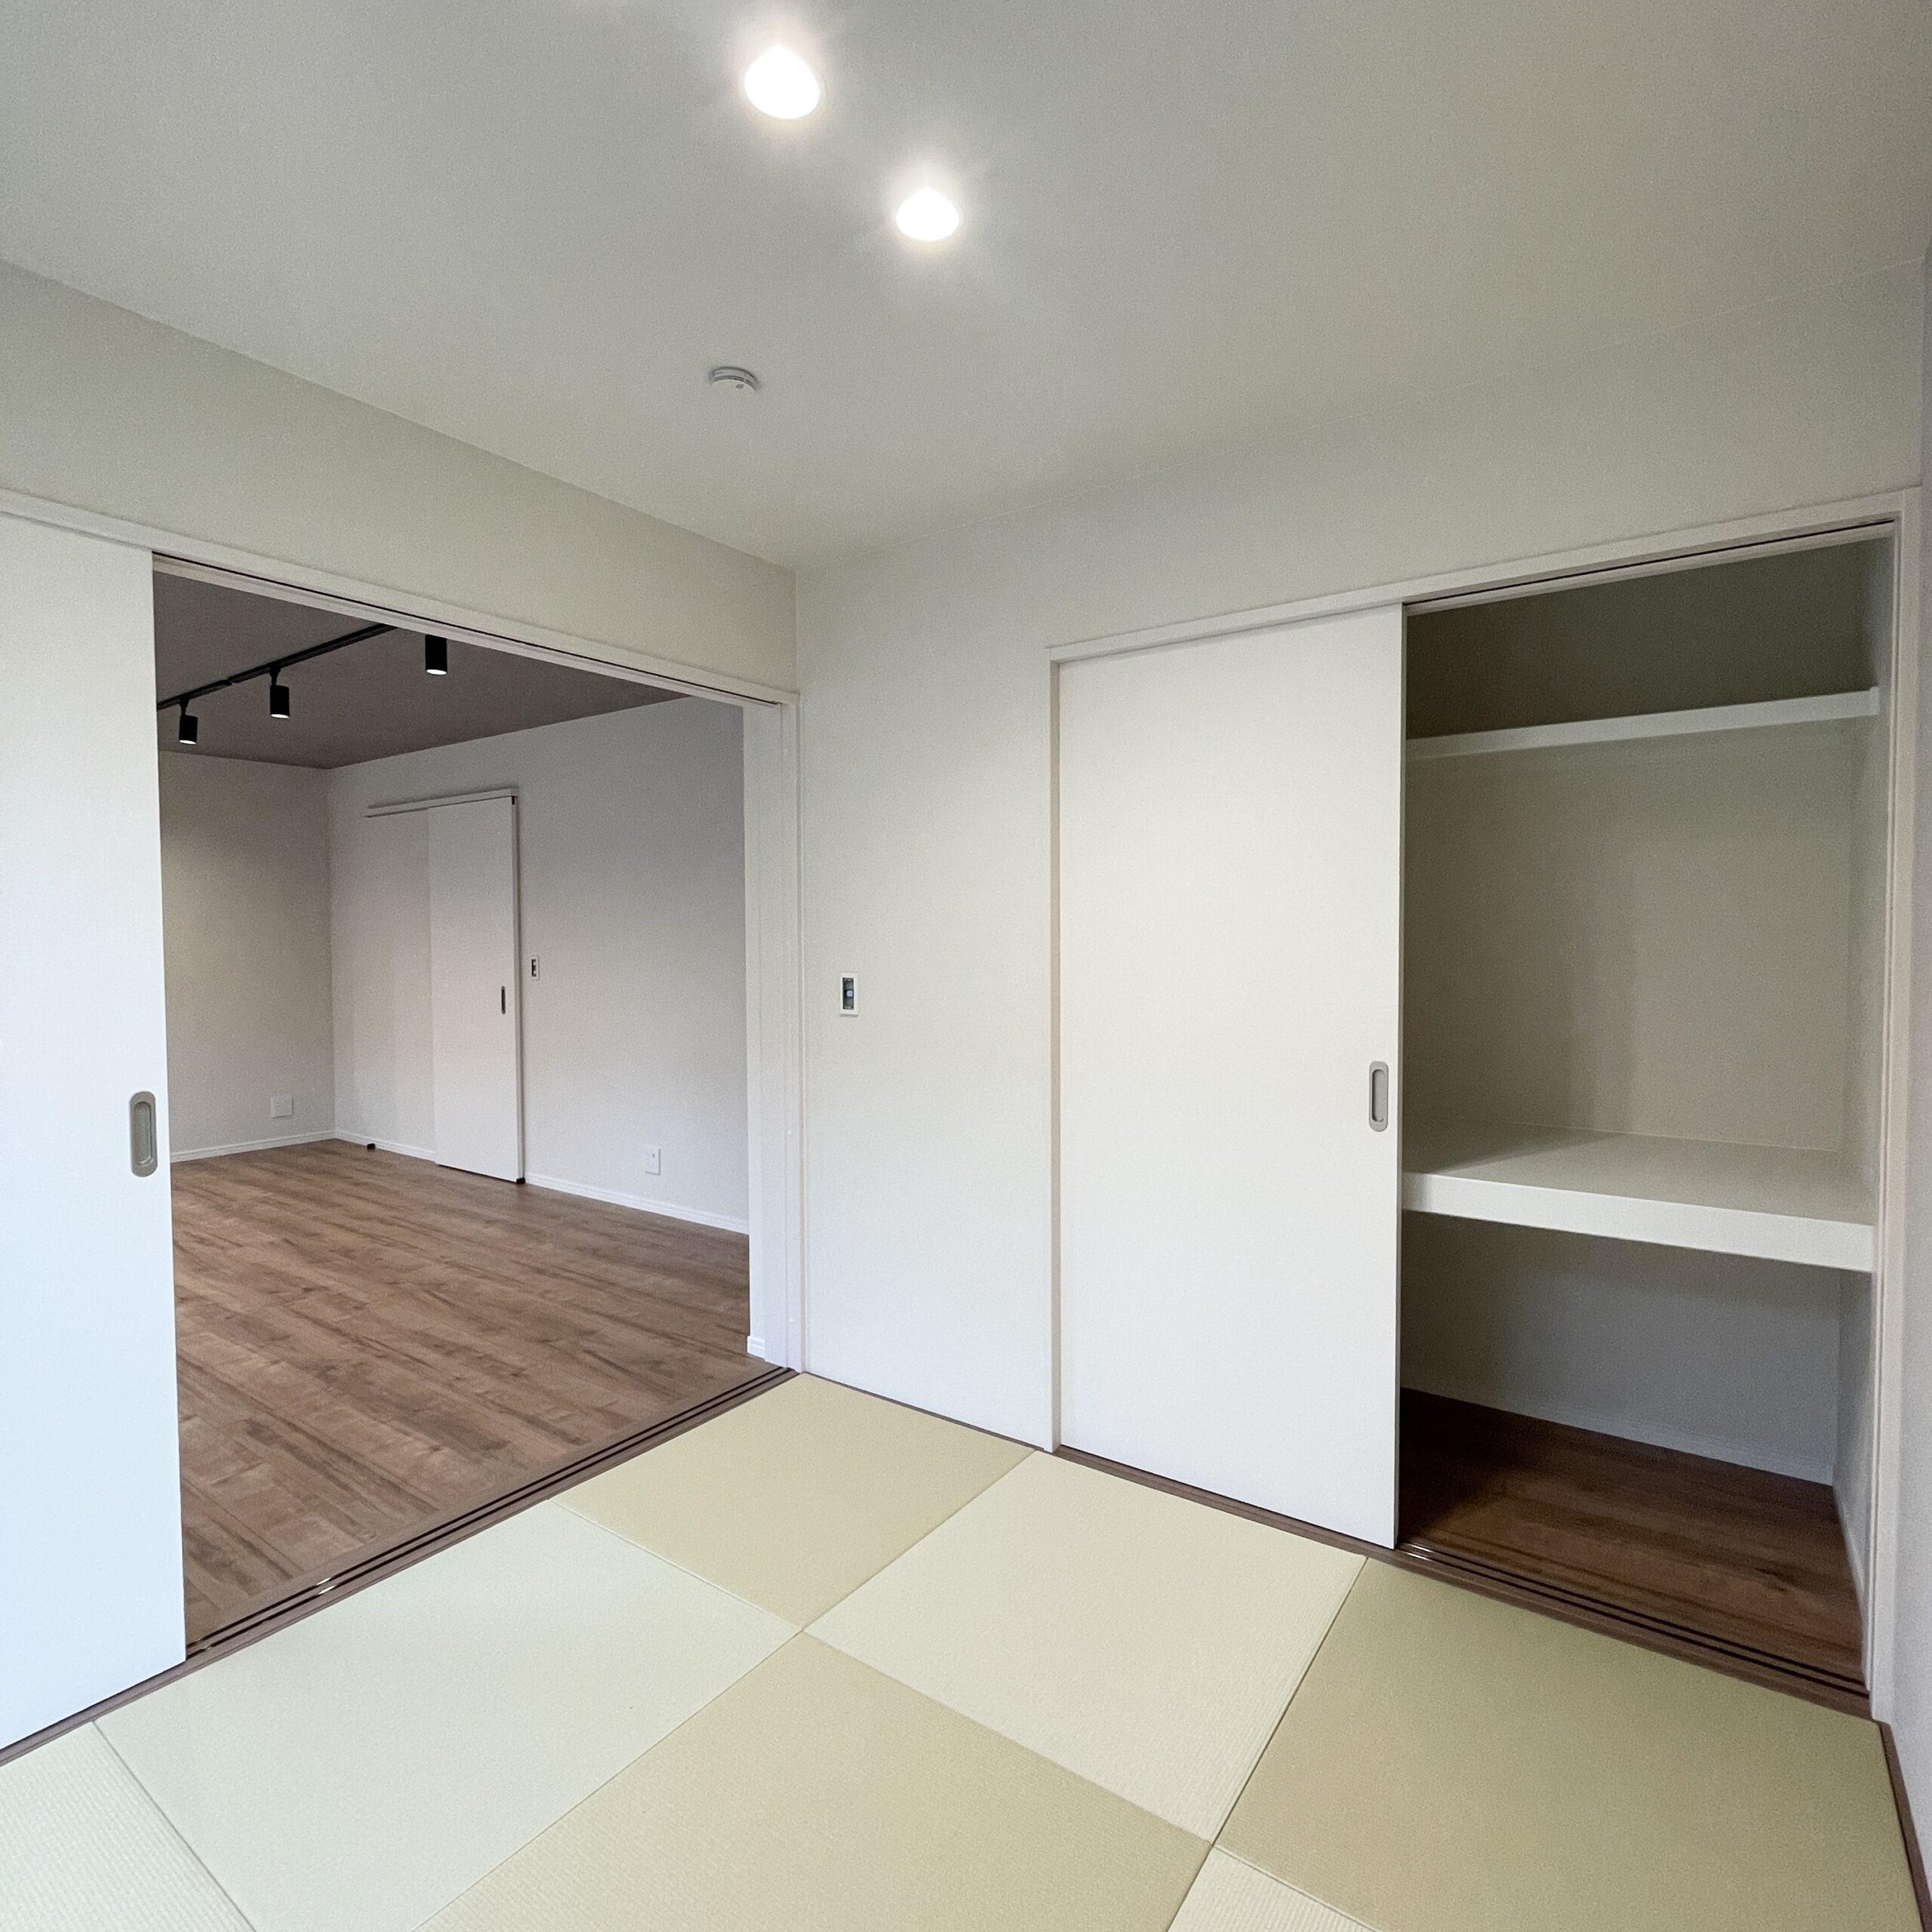 大村市新築建売住宅「OURS富の原2号地」